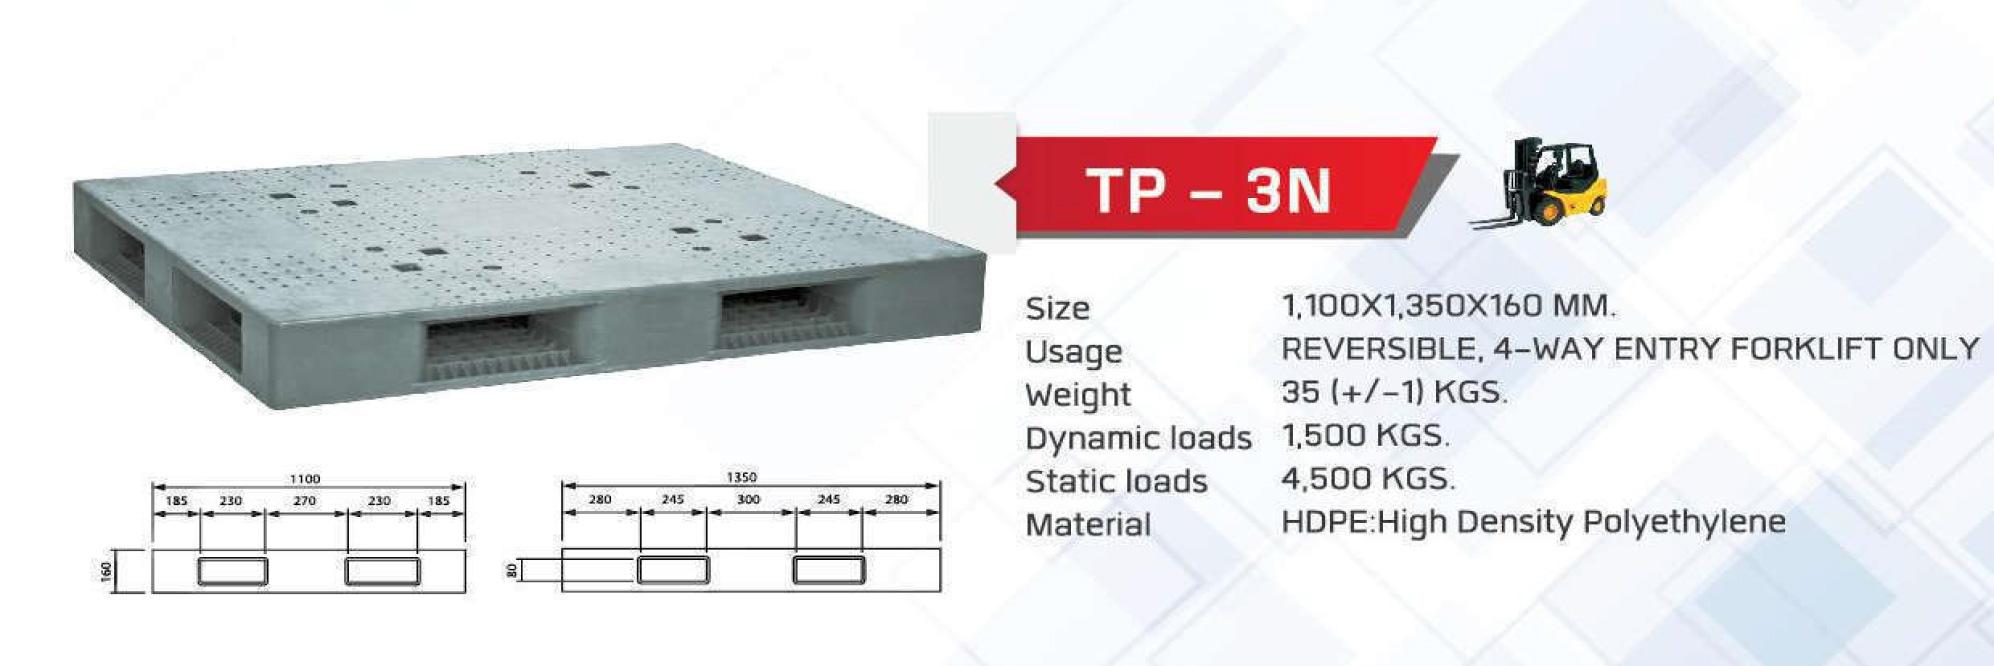 Reversible-HeavyDuty-TP-3N